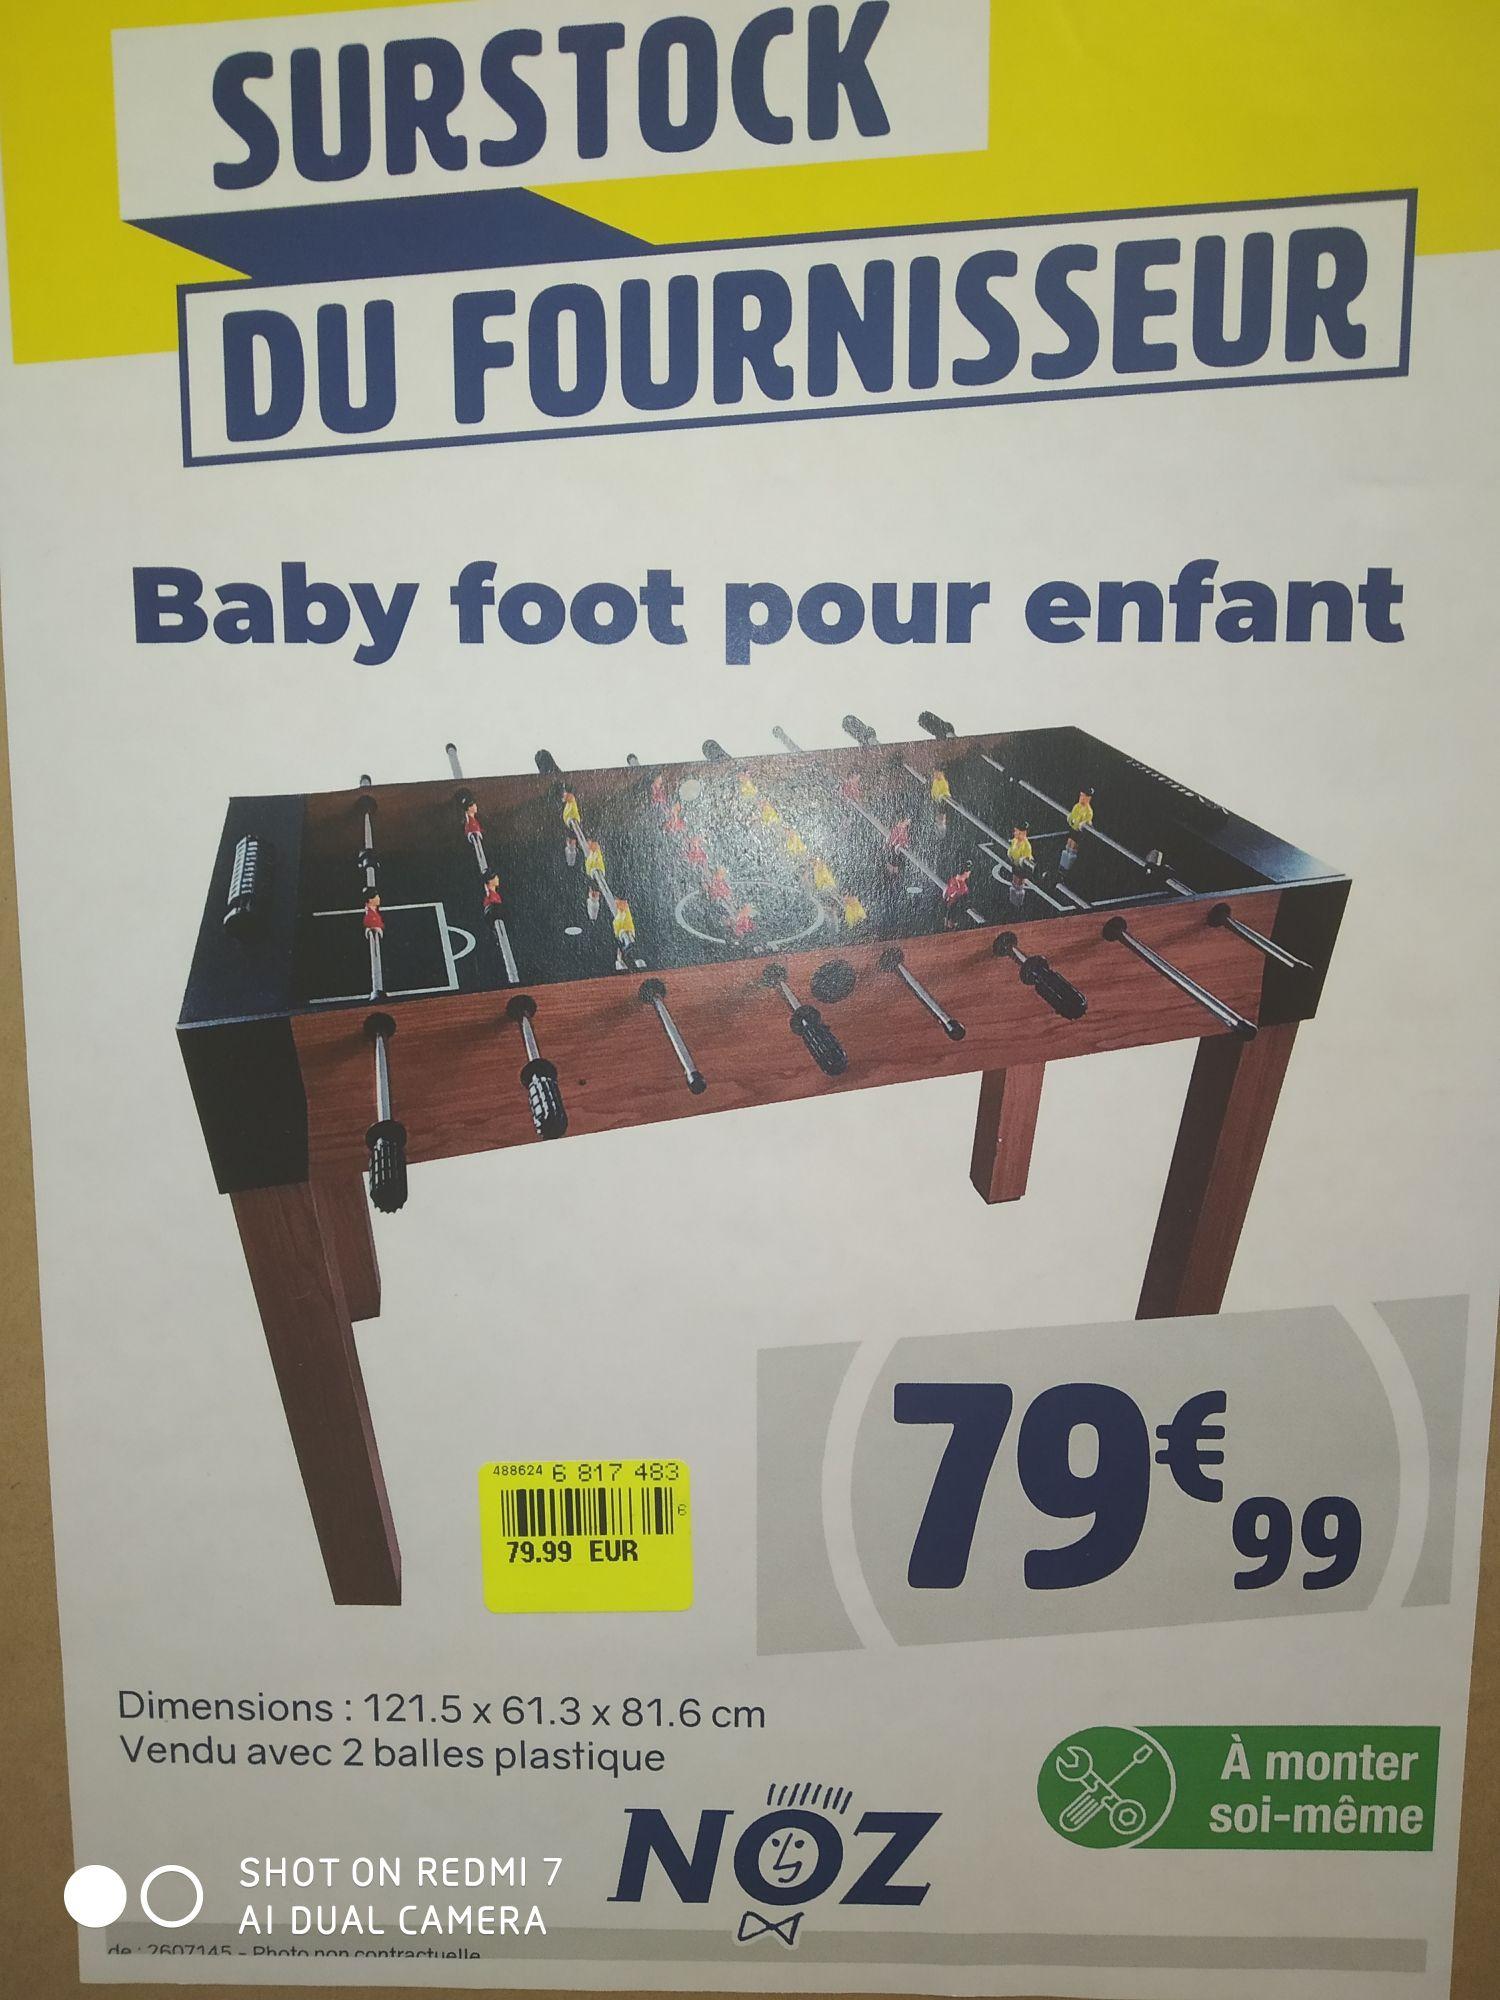 Baby Foot pour enfant - Colombiers (34)